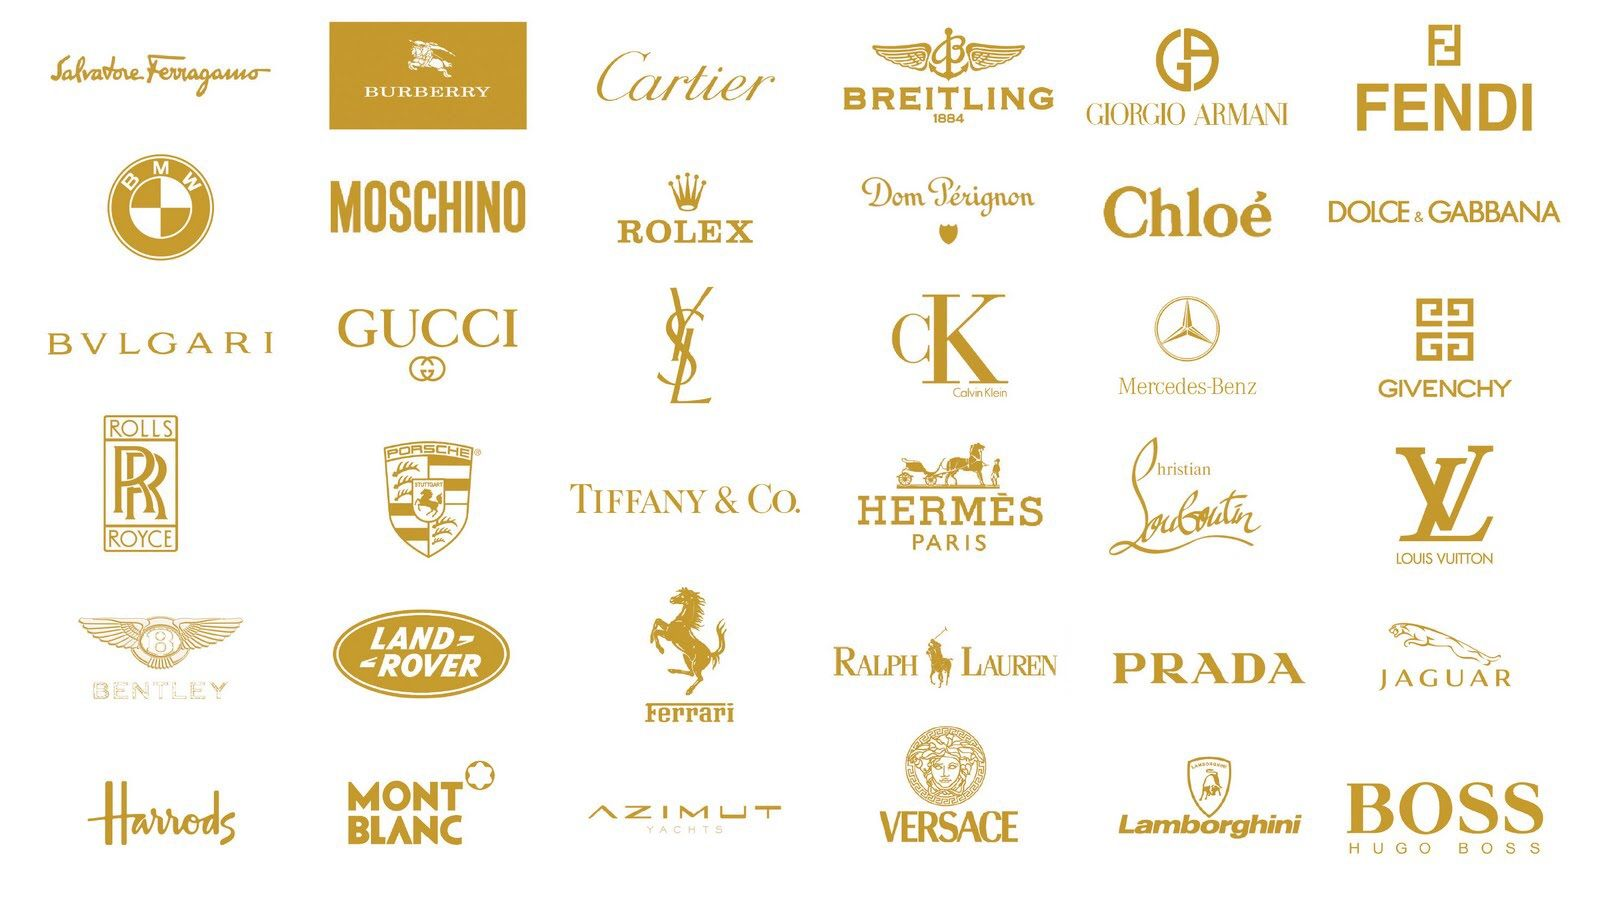 Pin by Sonia Takkar on games Luxury brand logo, Luxury